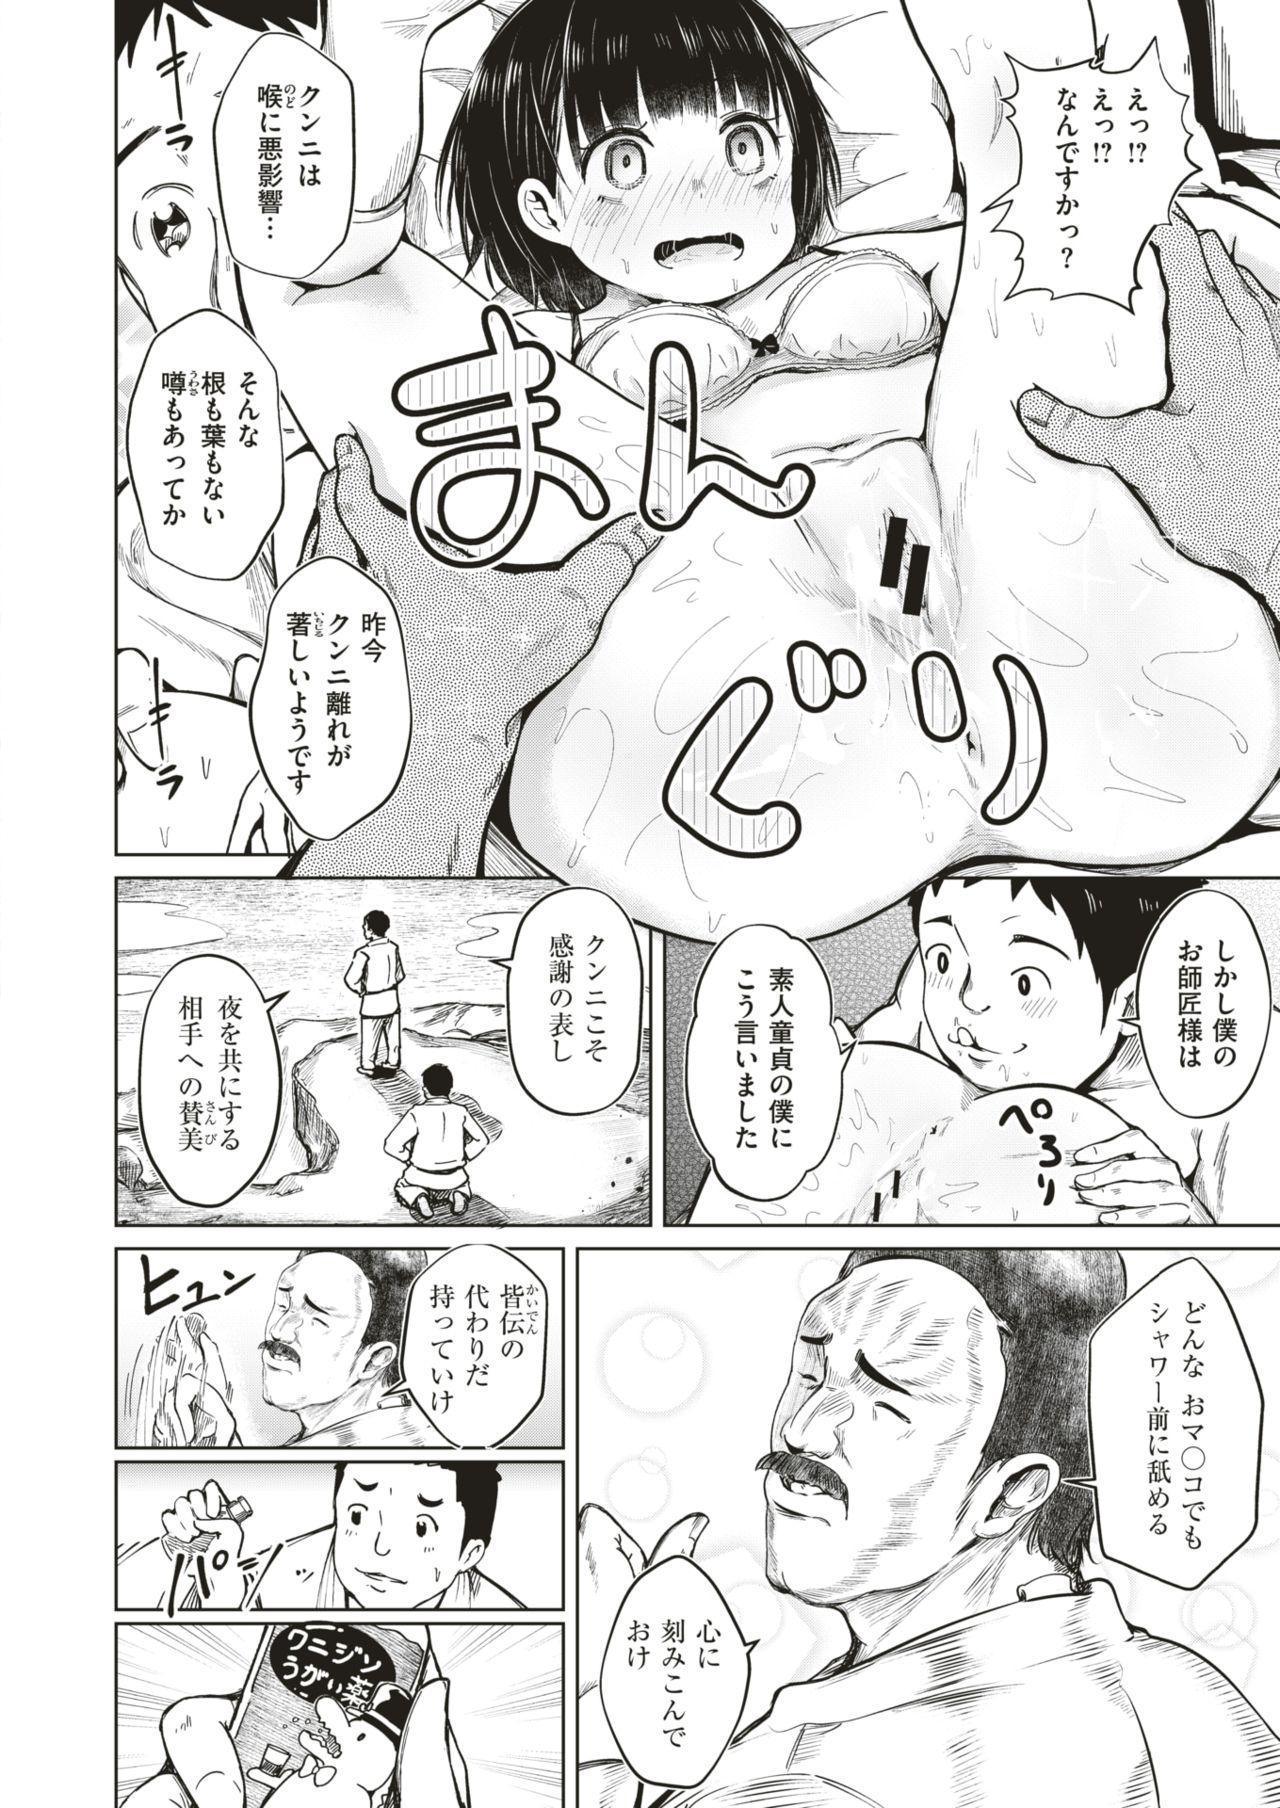 COMIC HAPPINING Vol. 4 116